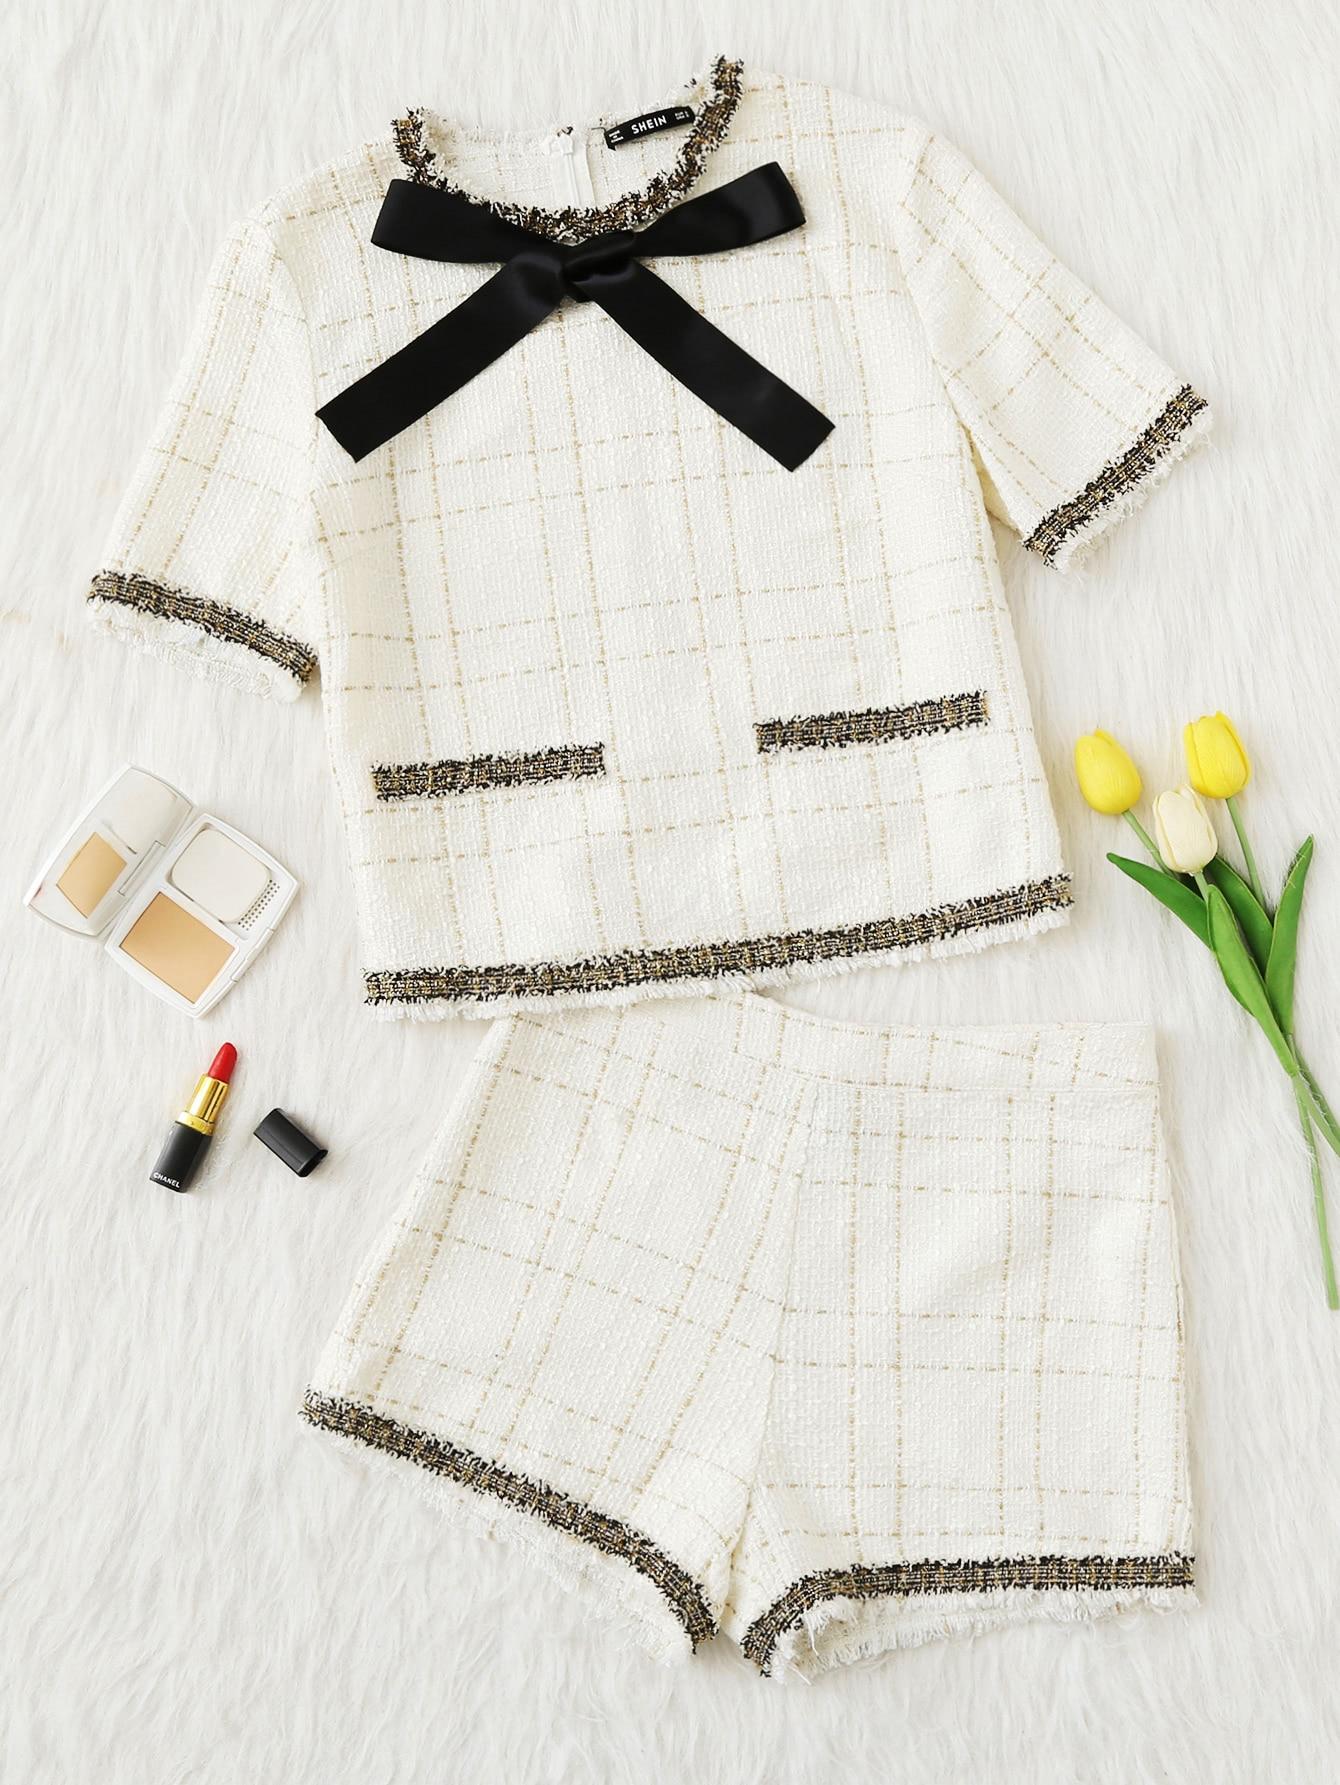 Frayed Tape Applique Tweed Top & Shorts Set rhinestone detail frayed edge tweed skirt